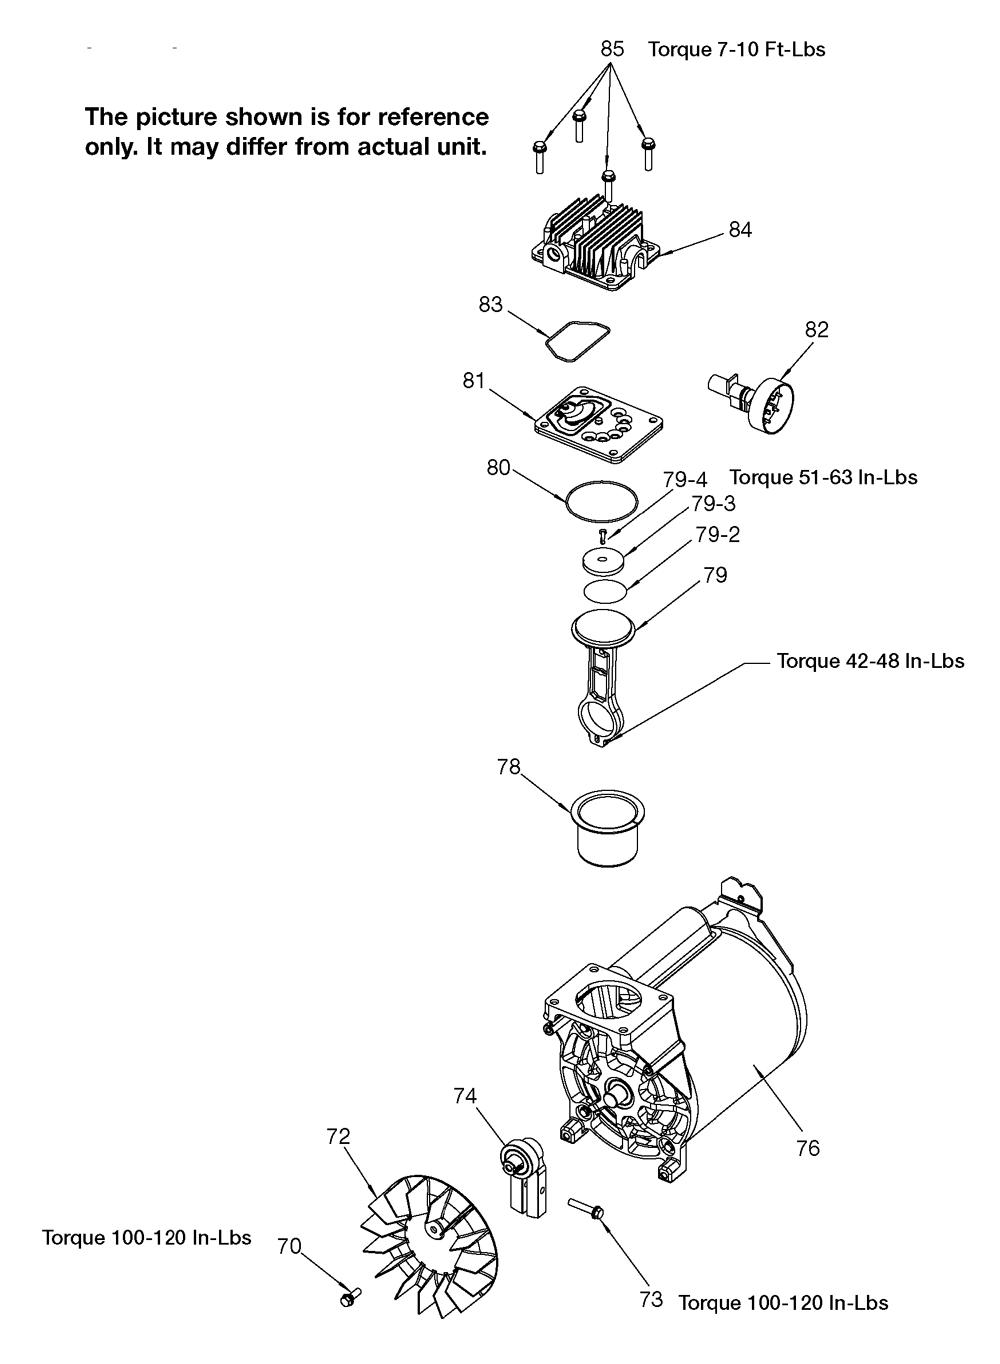 919-16731-Devilbiss-T0-PB-1Break Down